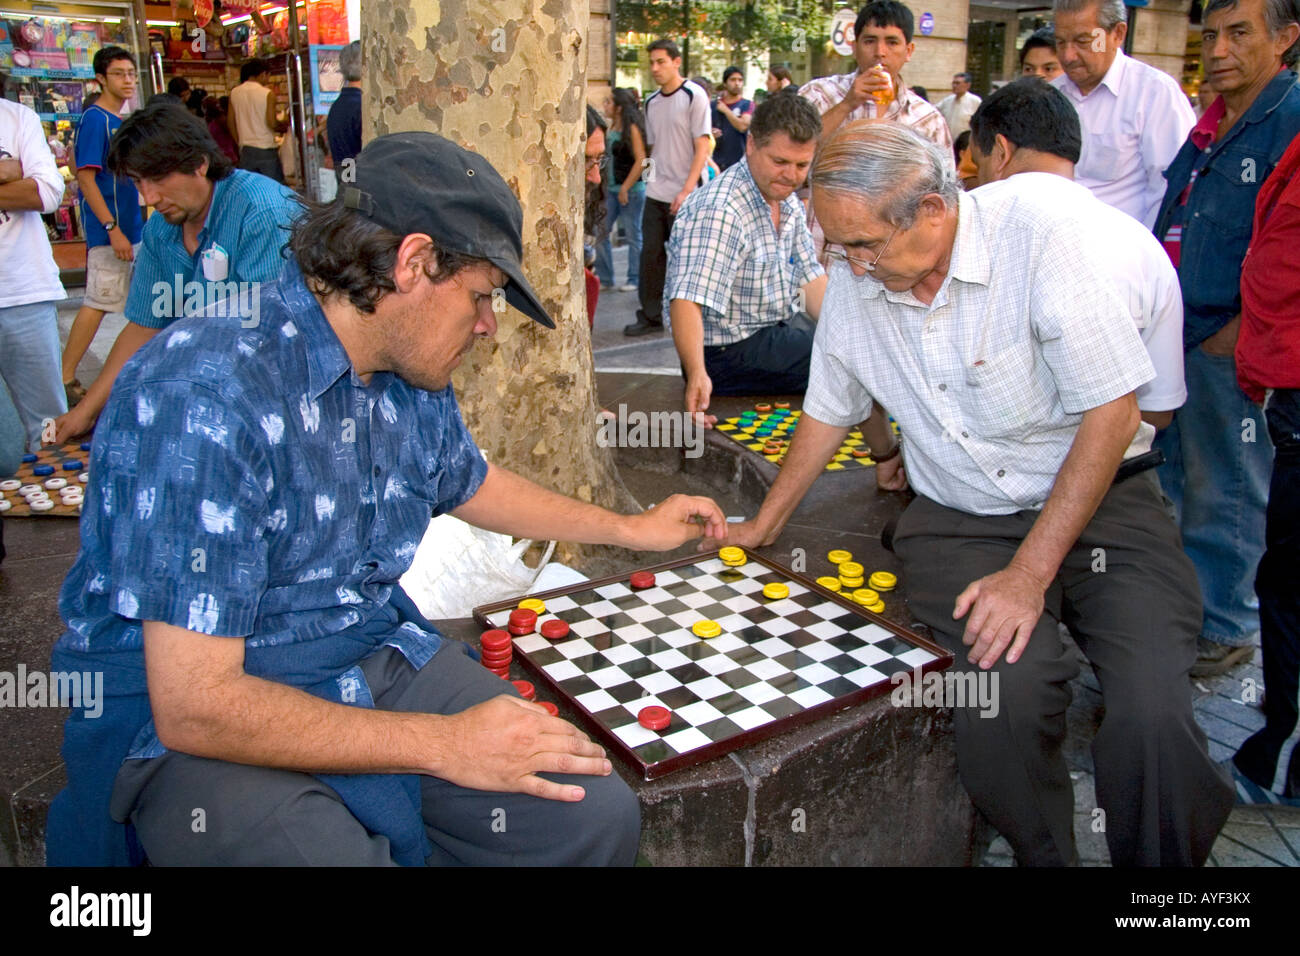 Chilean men play checkers in the Plaza de Armas in Santiago Chile - Stock Image